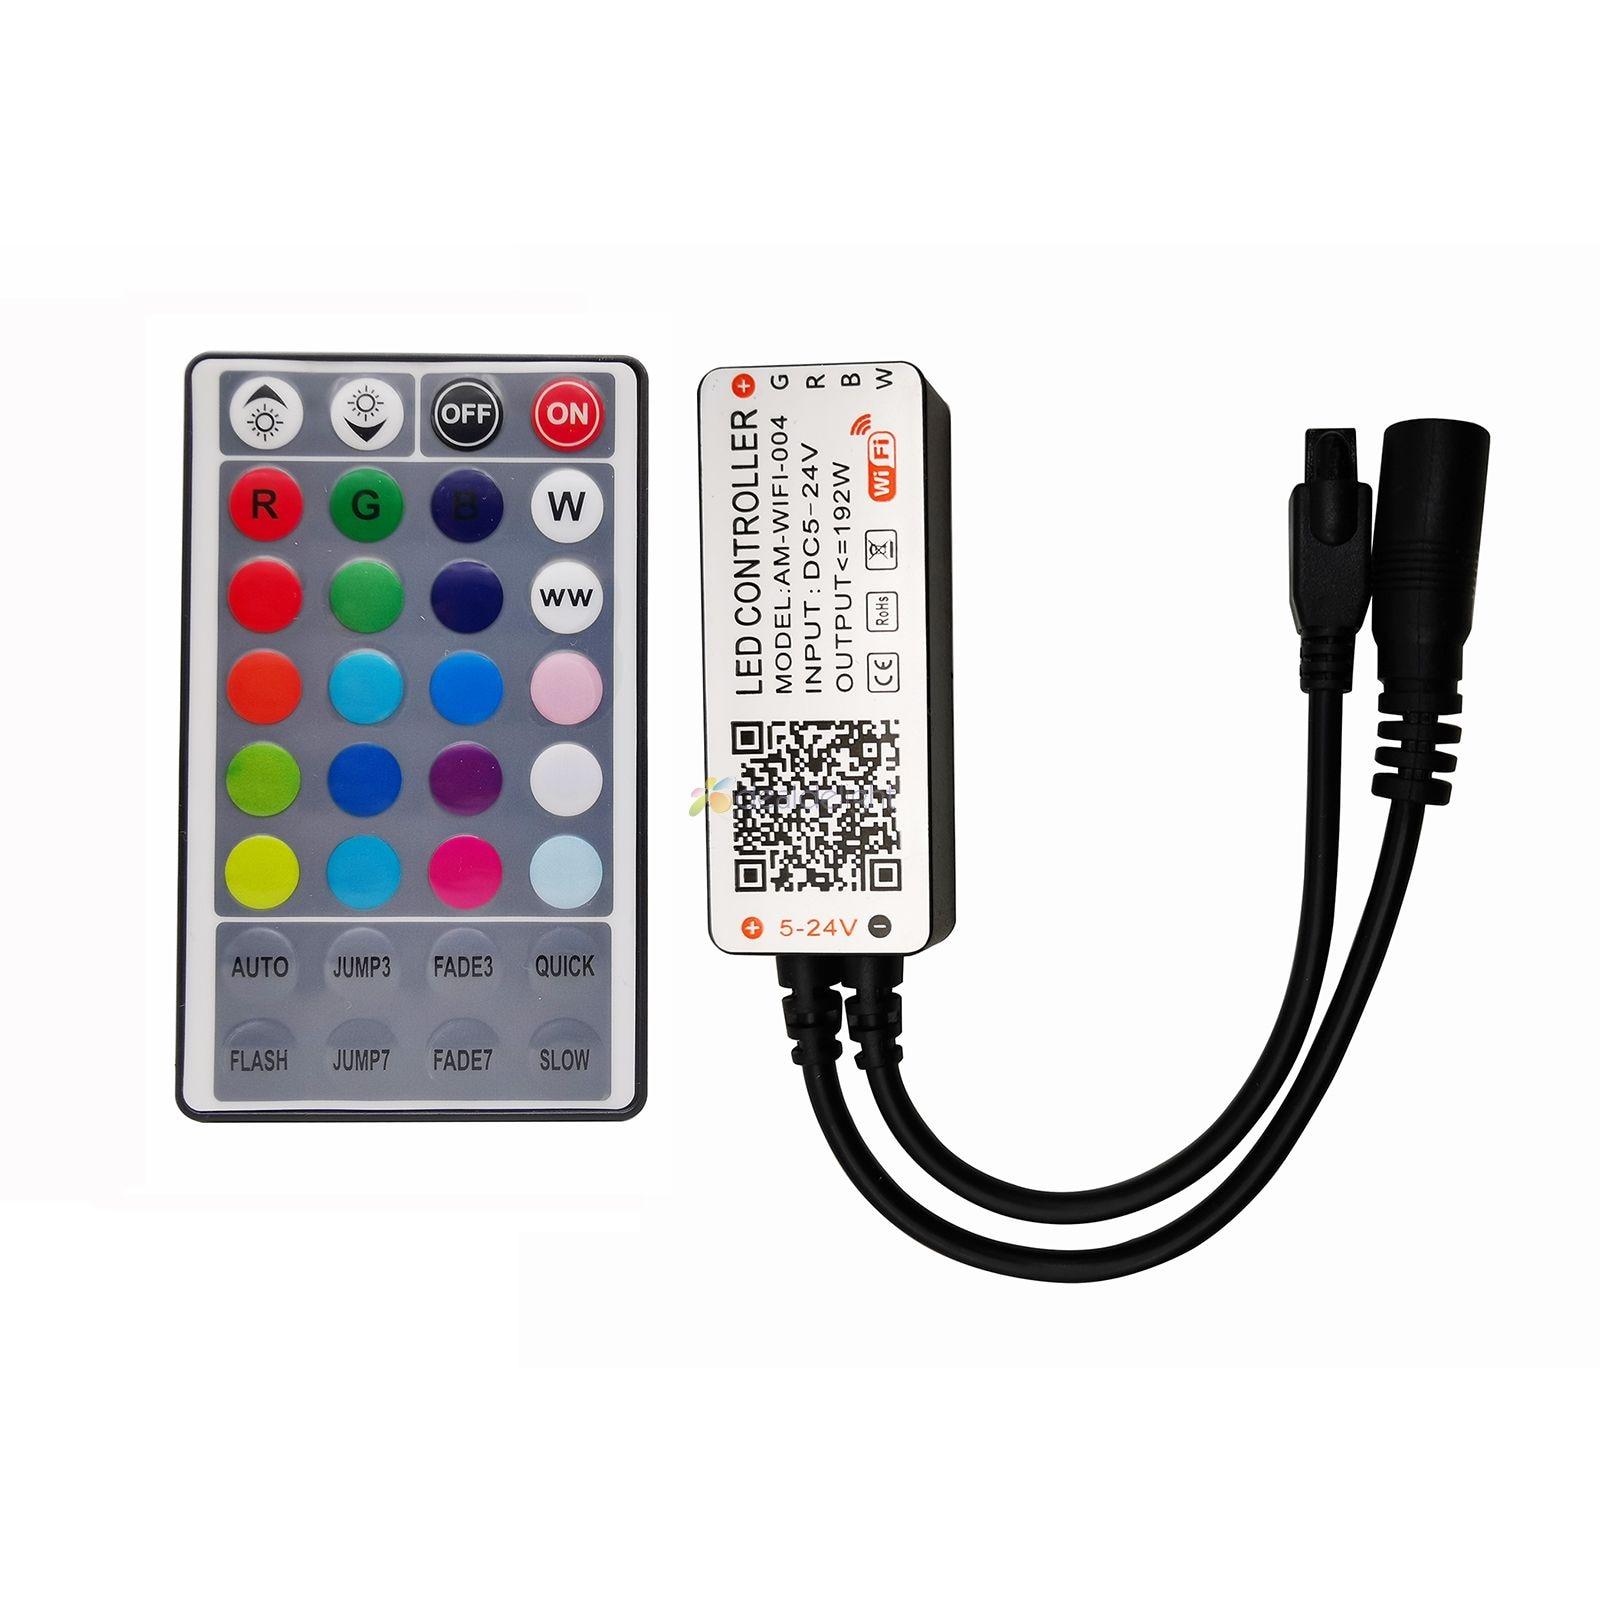 Tuya WiFi Intelligent LED Controller 4-Way RGBW Lamp Strip Controller DC 5-24V With 28keys IR Remote Control MAX 192W